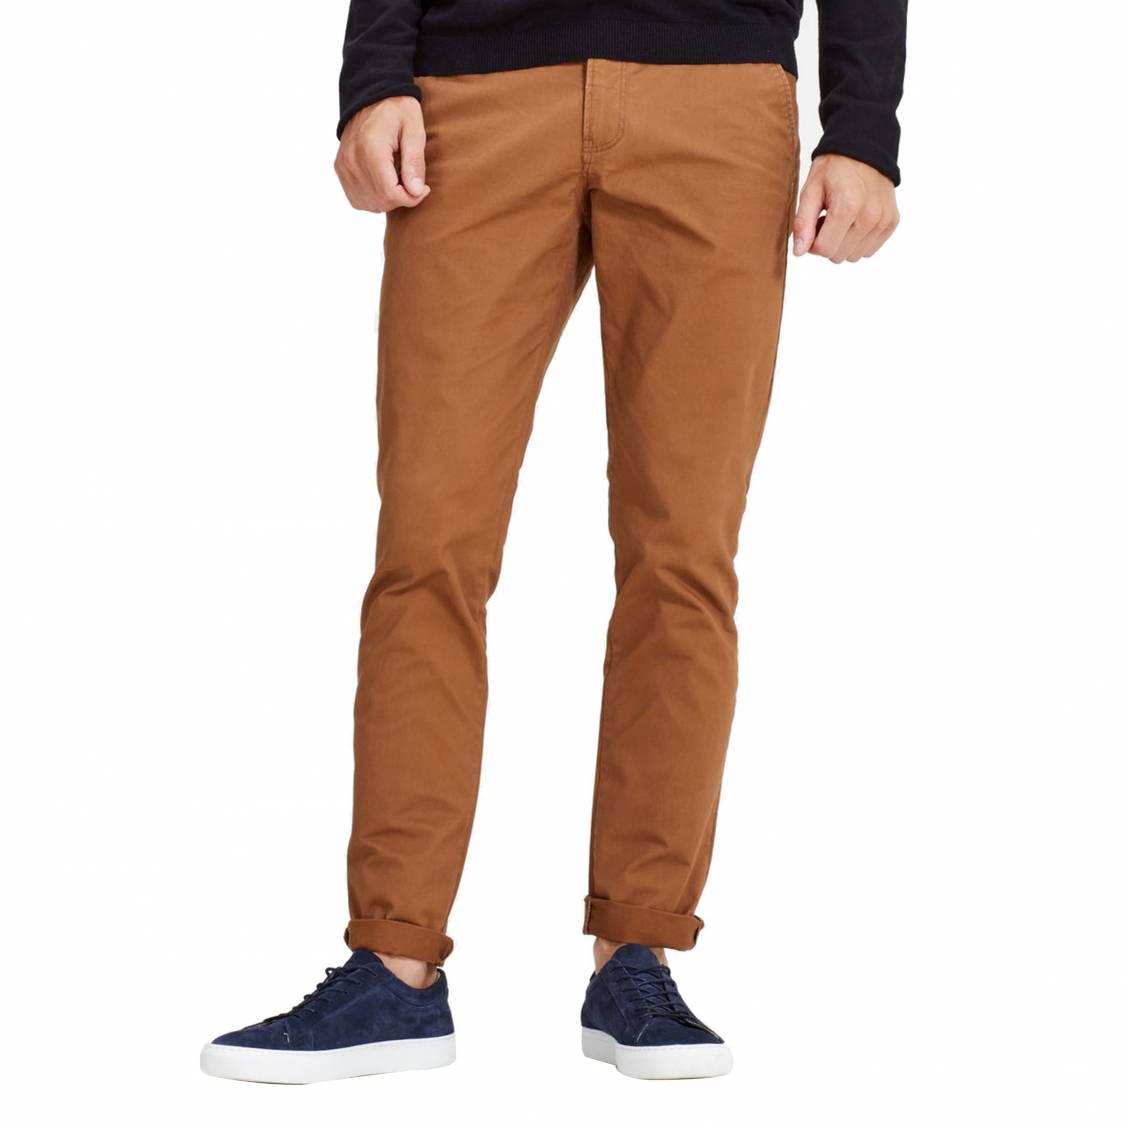 Pantalon Jack   Jones camel avec ceinture marron   Rue Des Hommes 33299dd21a1e